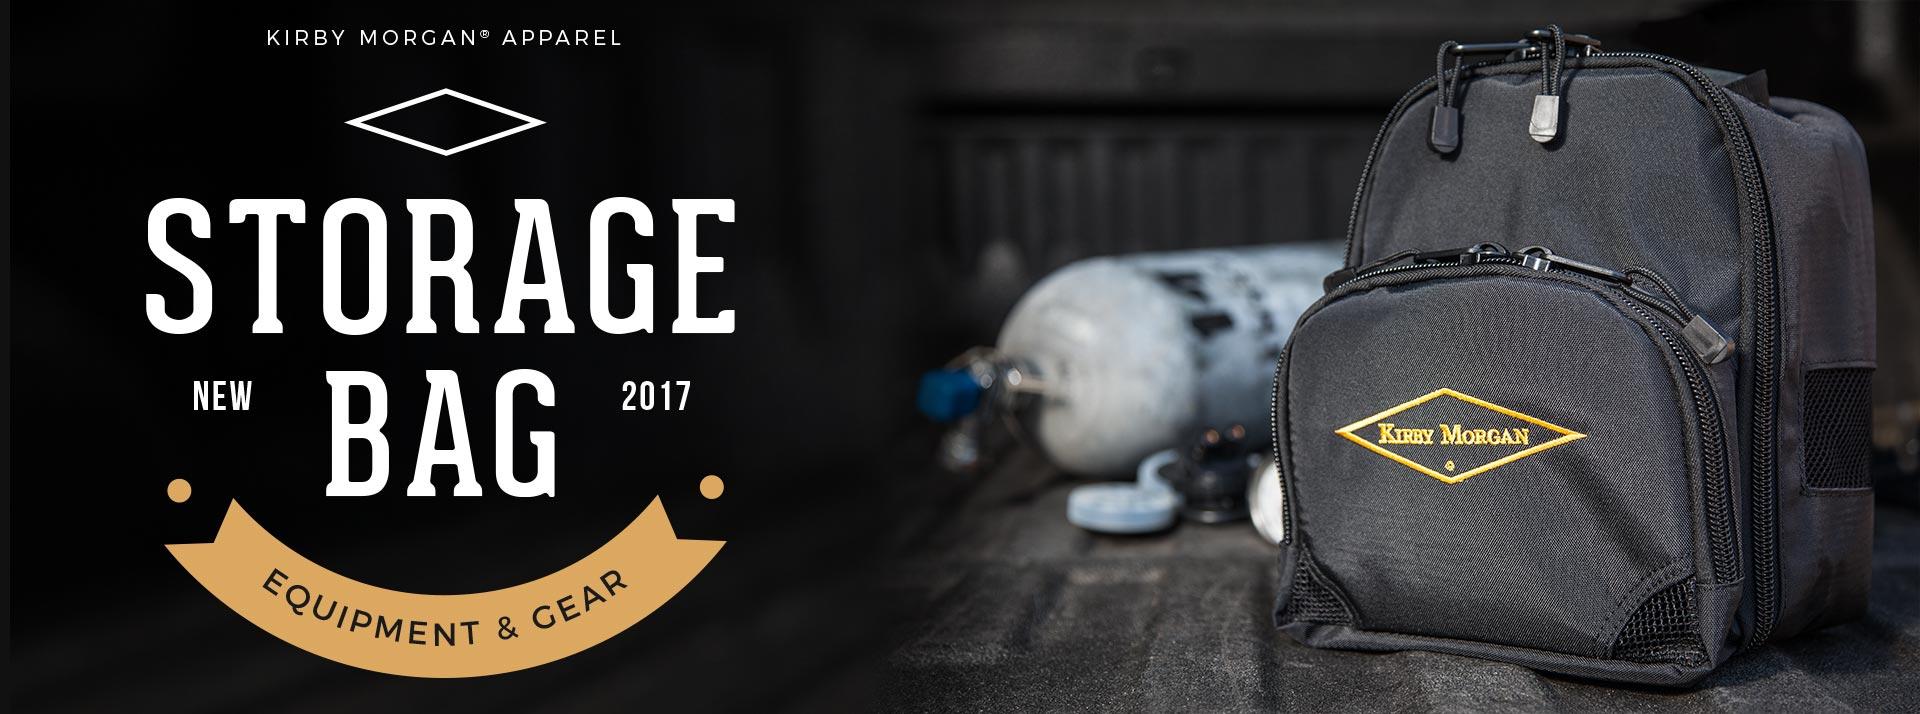 Kirby Morgan Storage Bag